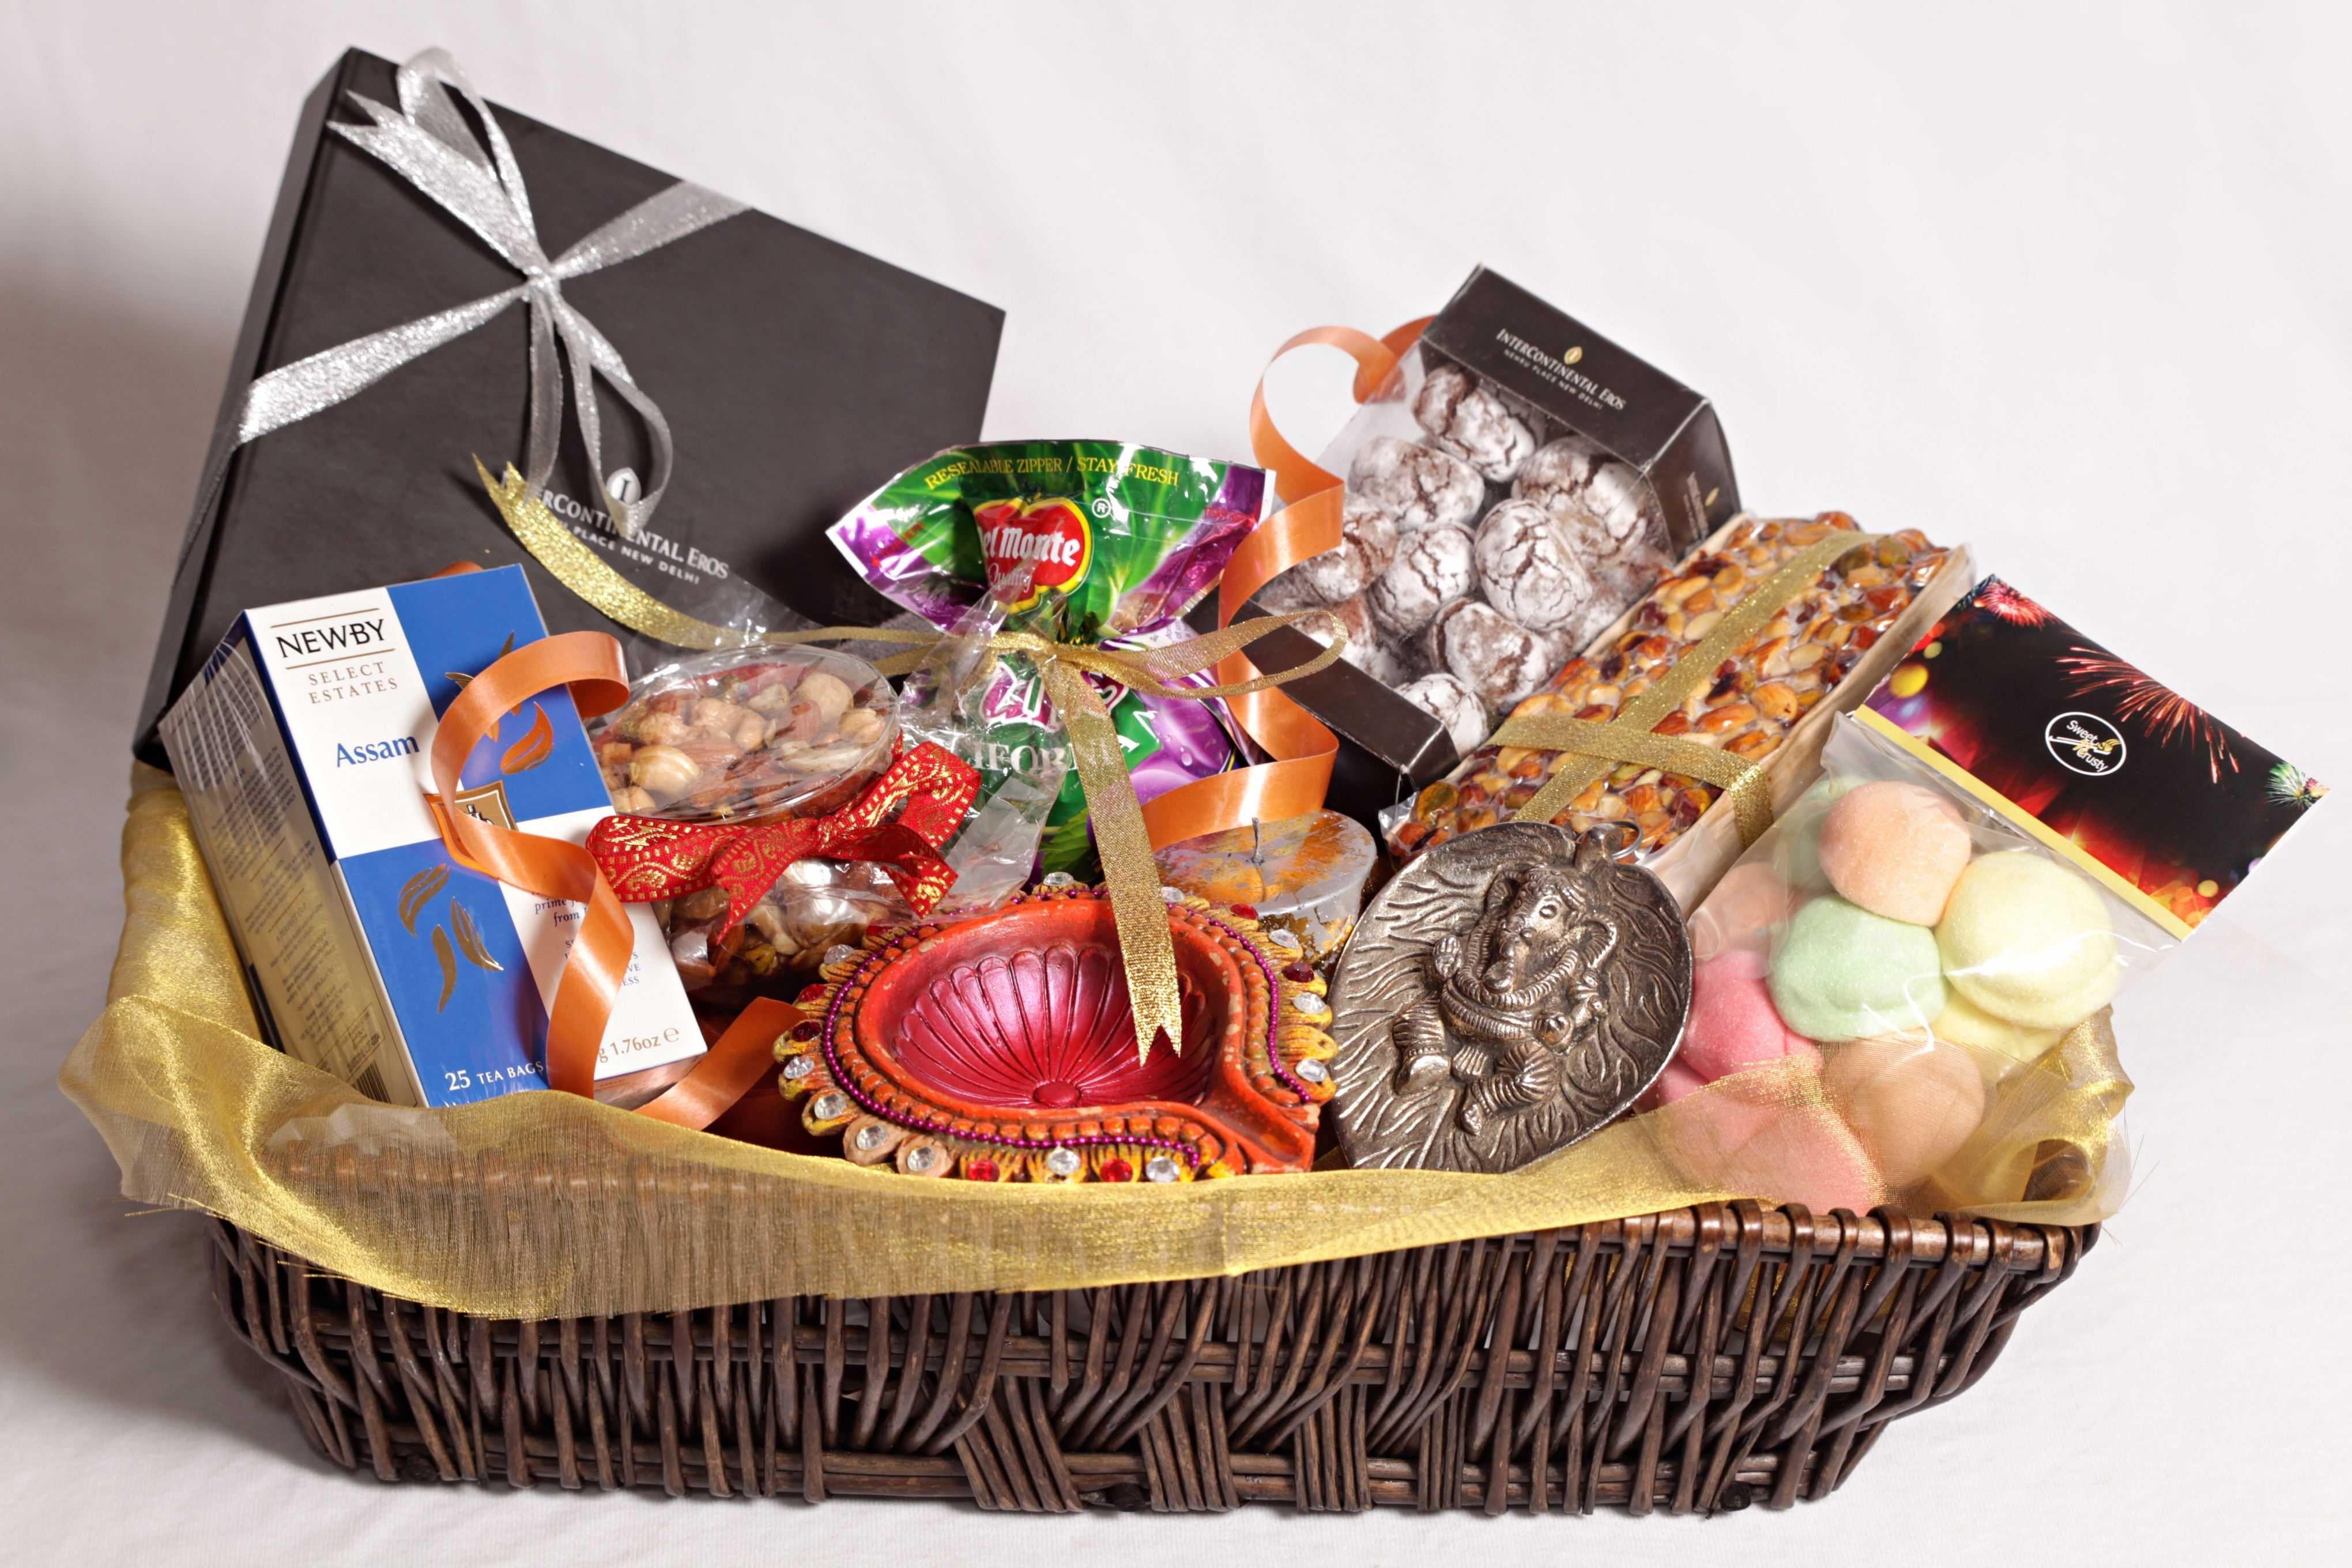 10 Lovable Gift Ideas For Family Members best diwali gift ideas for friends family members diwali 2018 2021